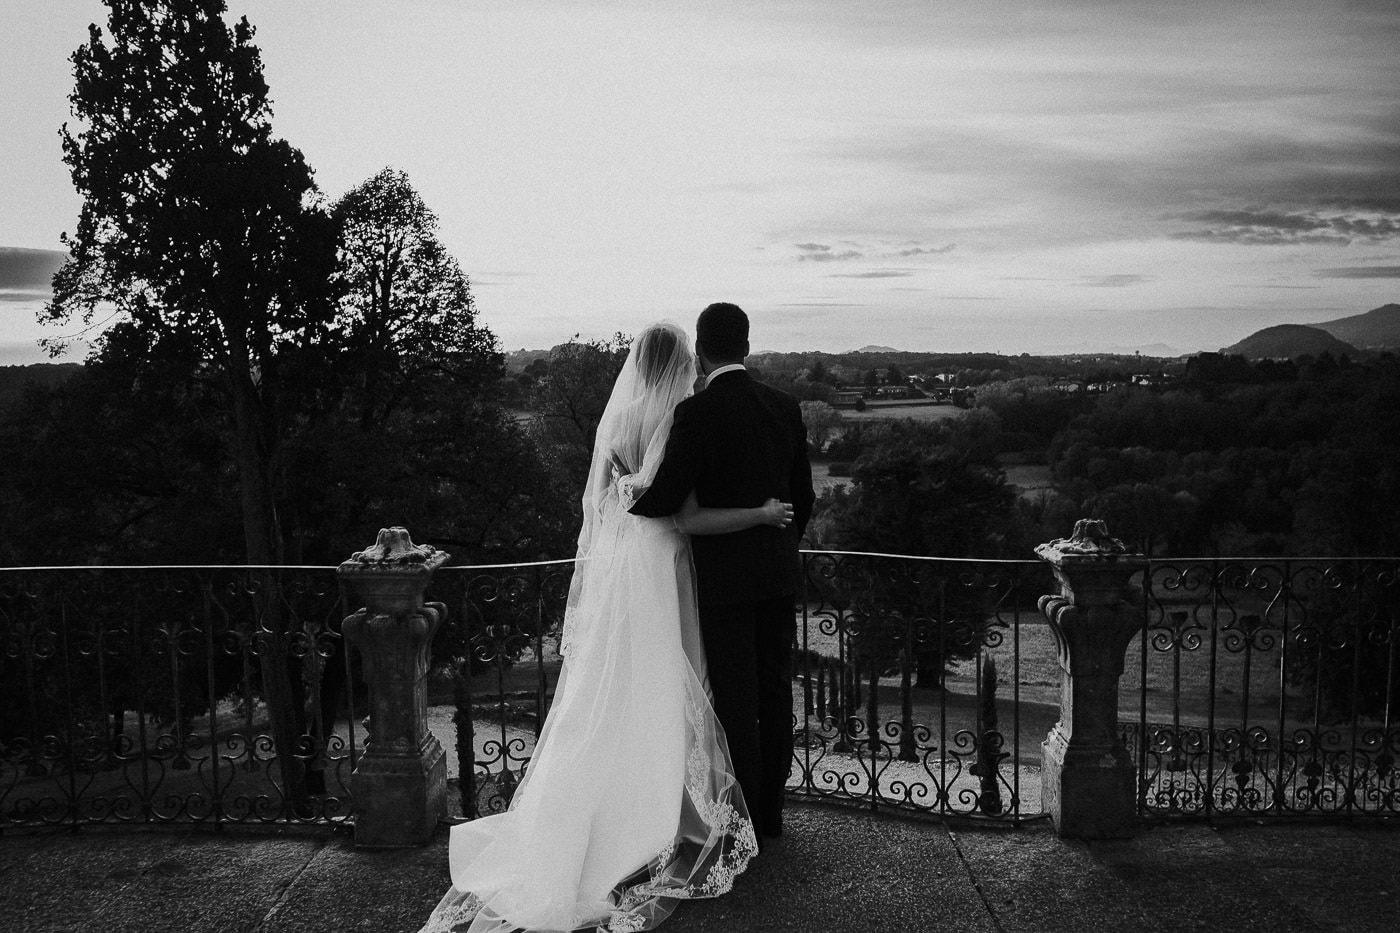 ritratto sposi matrimonio castello durini panorama